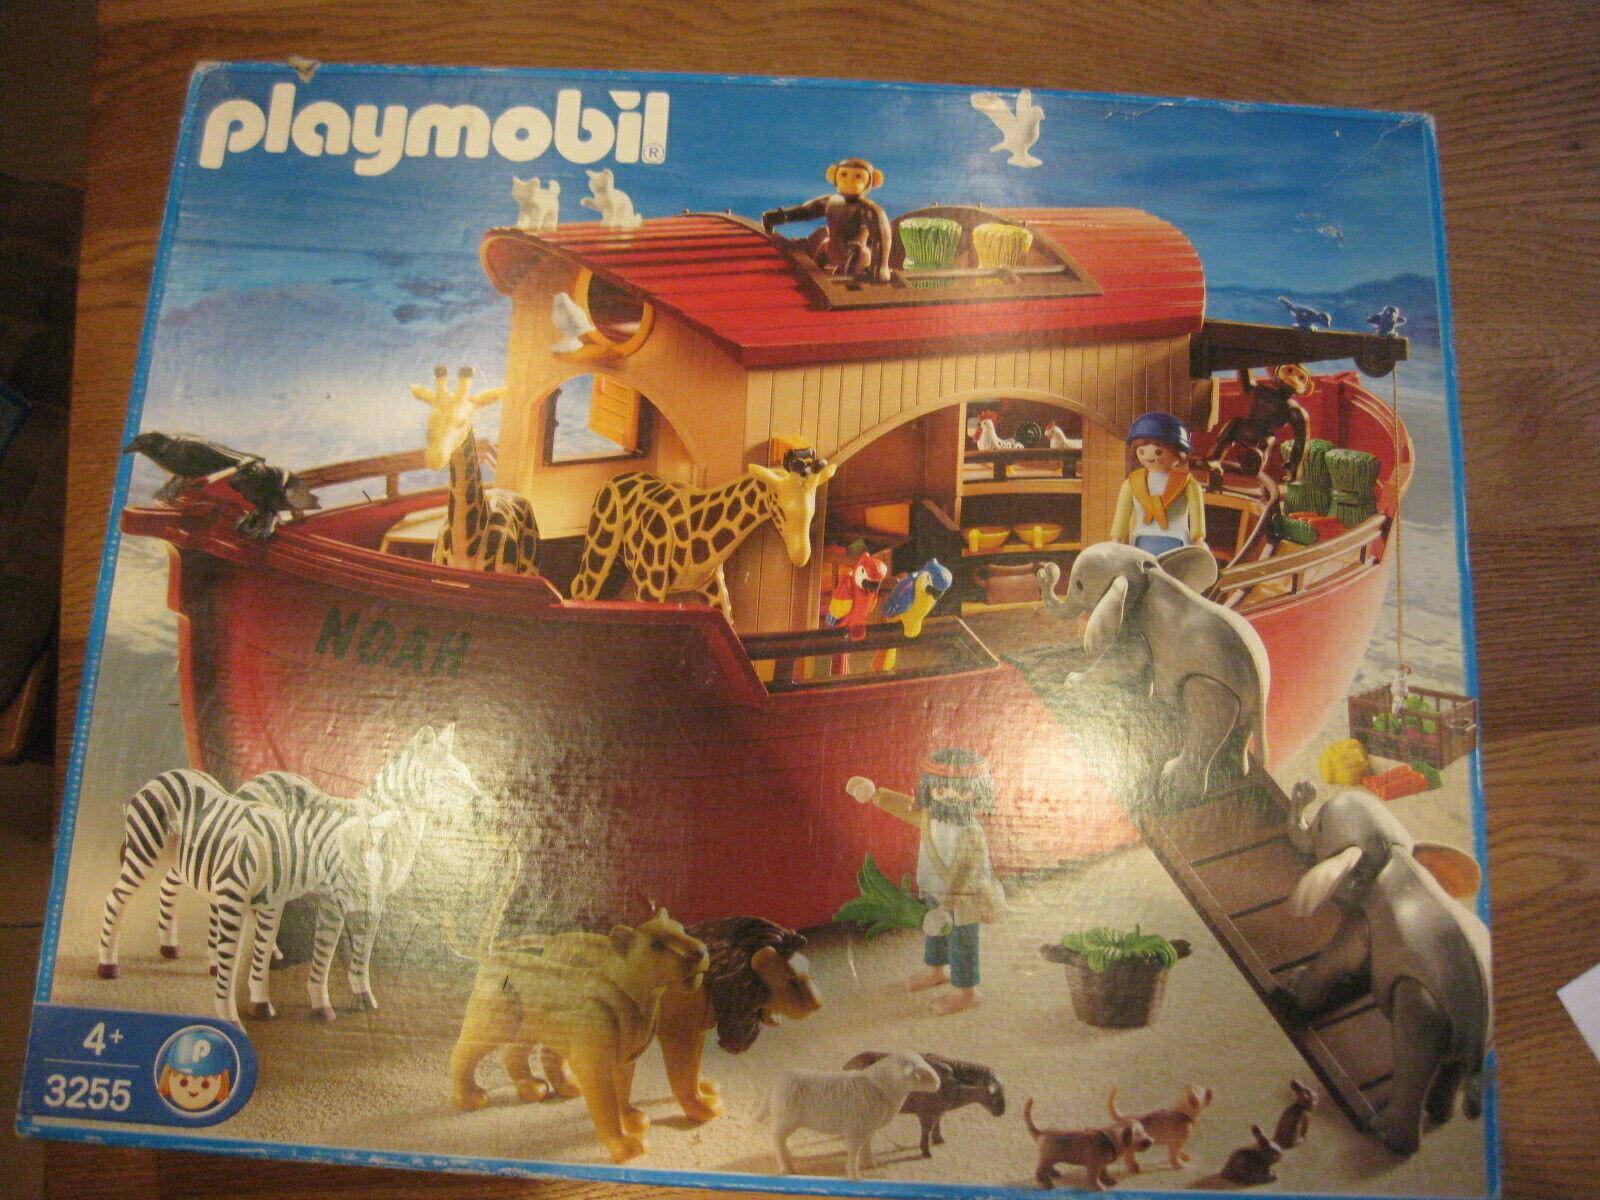 Playmobil 3255, Arche Noah, sehr gut erhalten